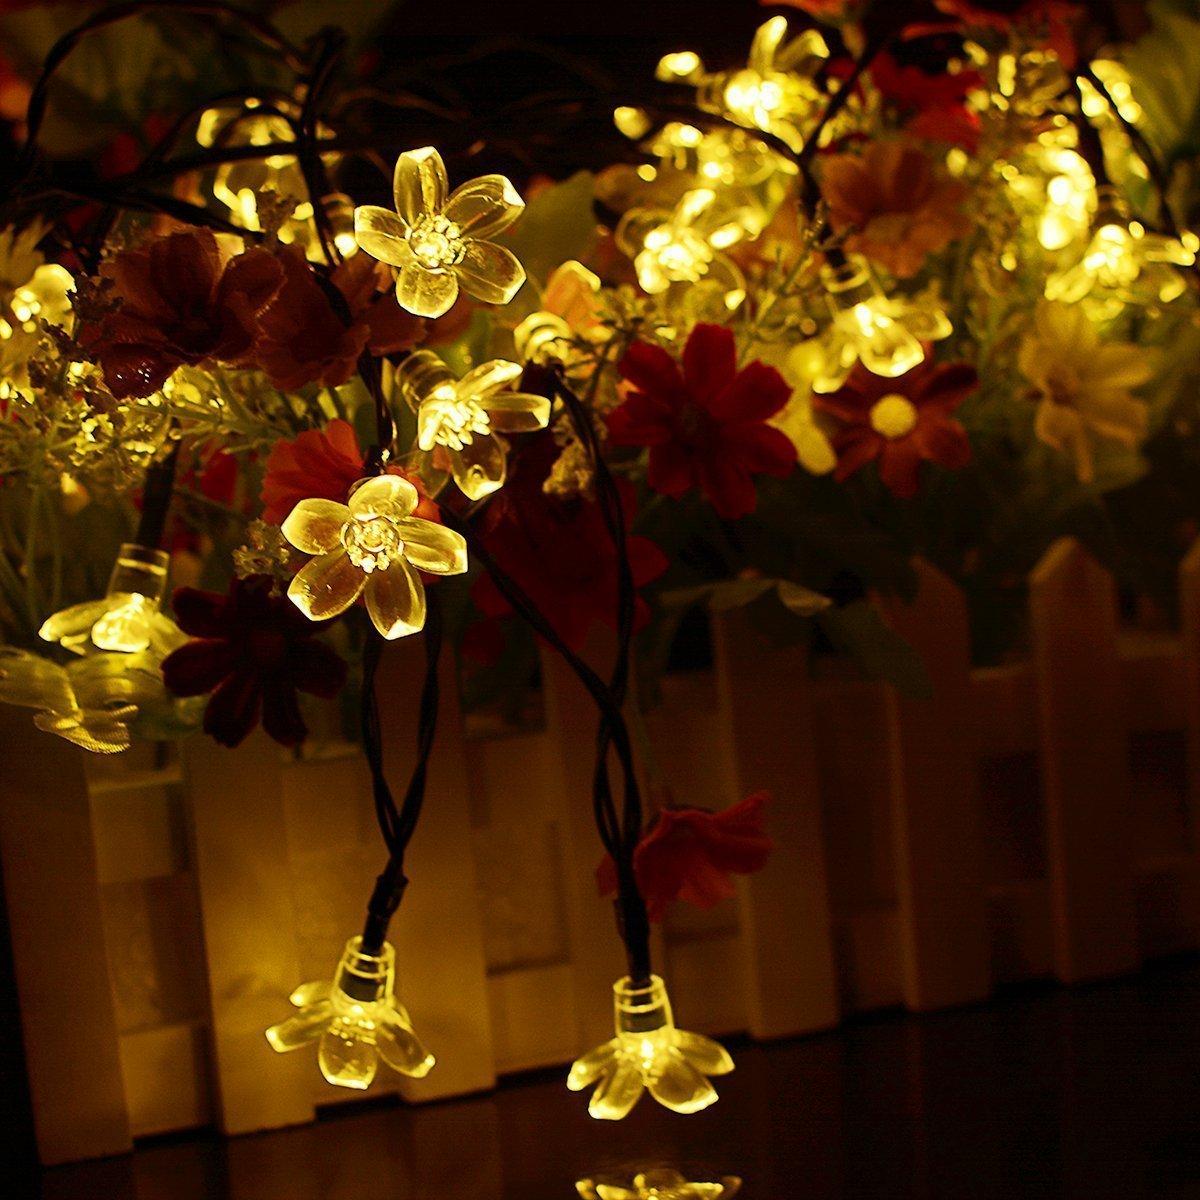 Dcoo Solar String Lights 50 LEDs Fairy Flower Blossom Christmas Fairy Party Lights Outdoor Lighting Strings Garden Solar Lights